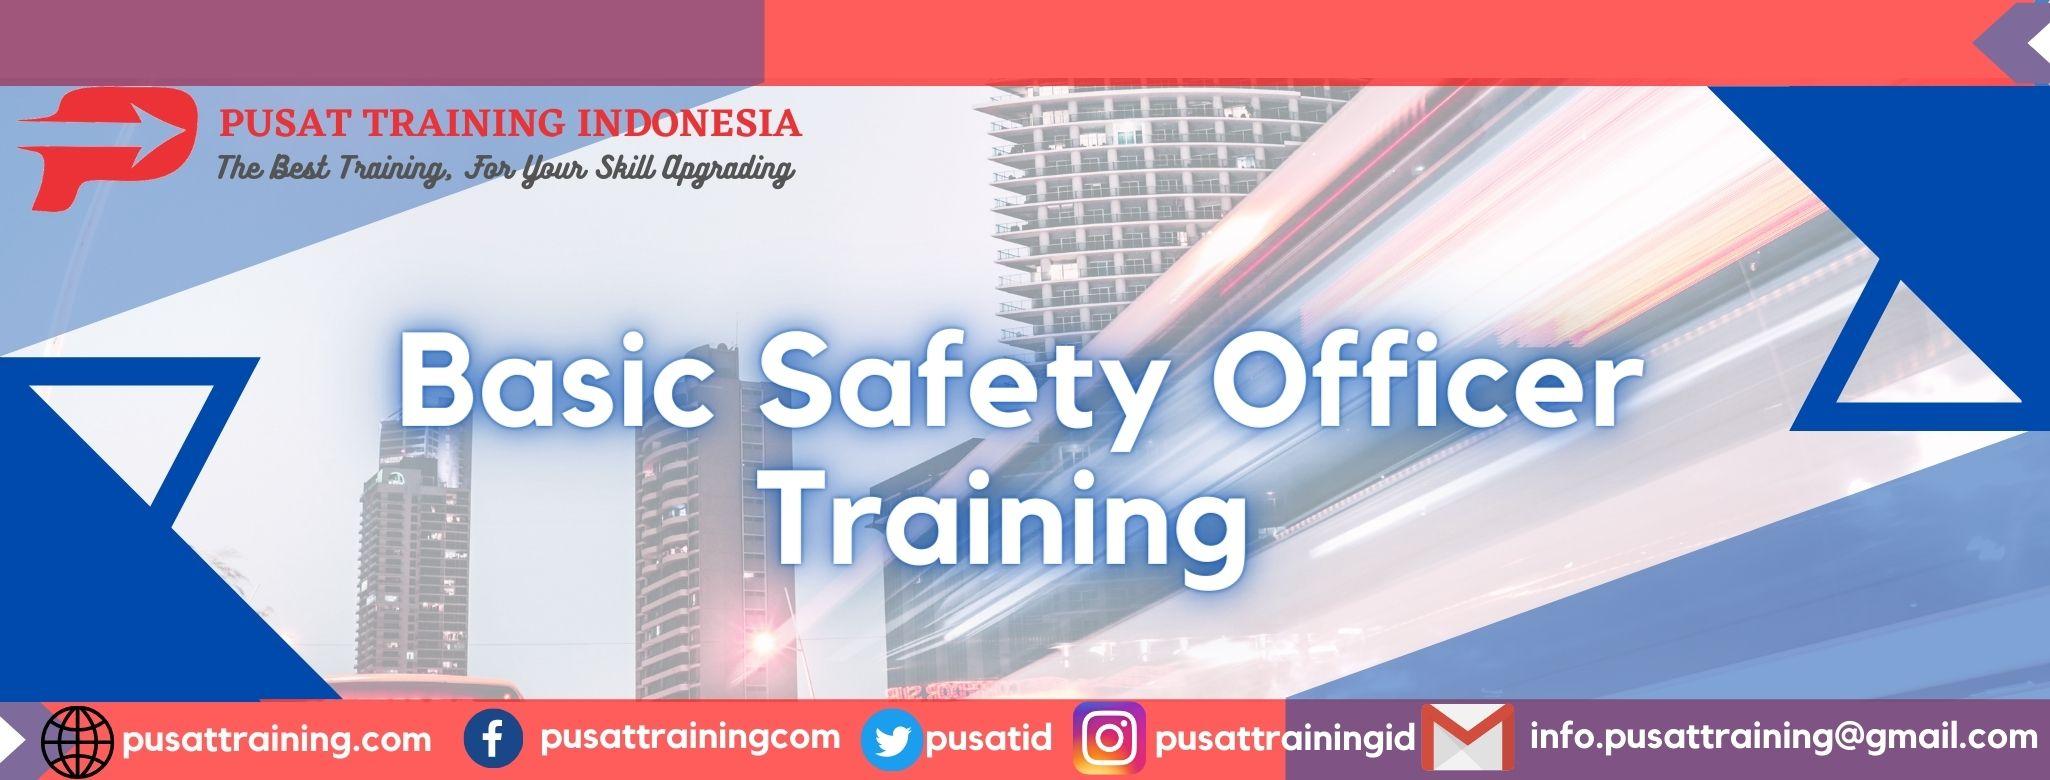 Basic-Safety-Officer-Training